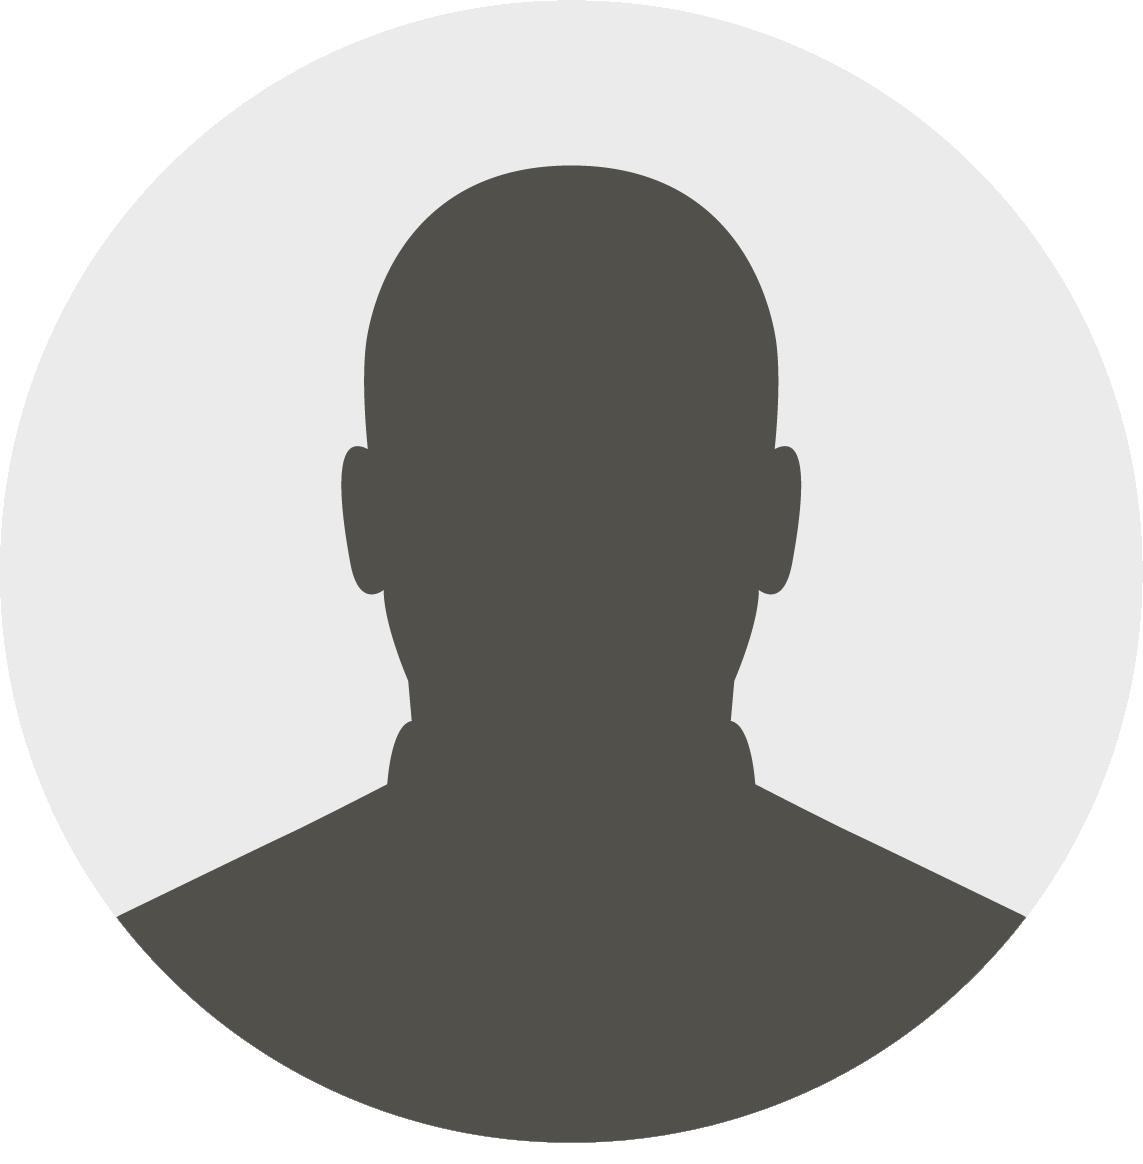 David Adeoye